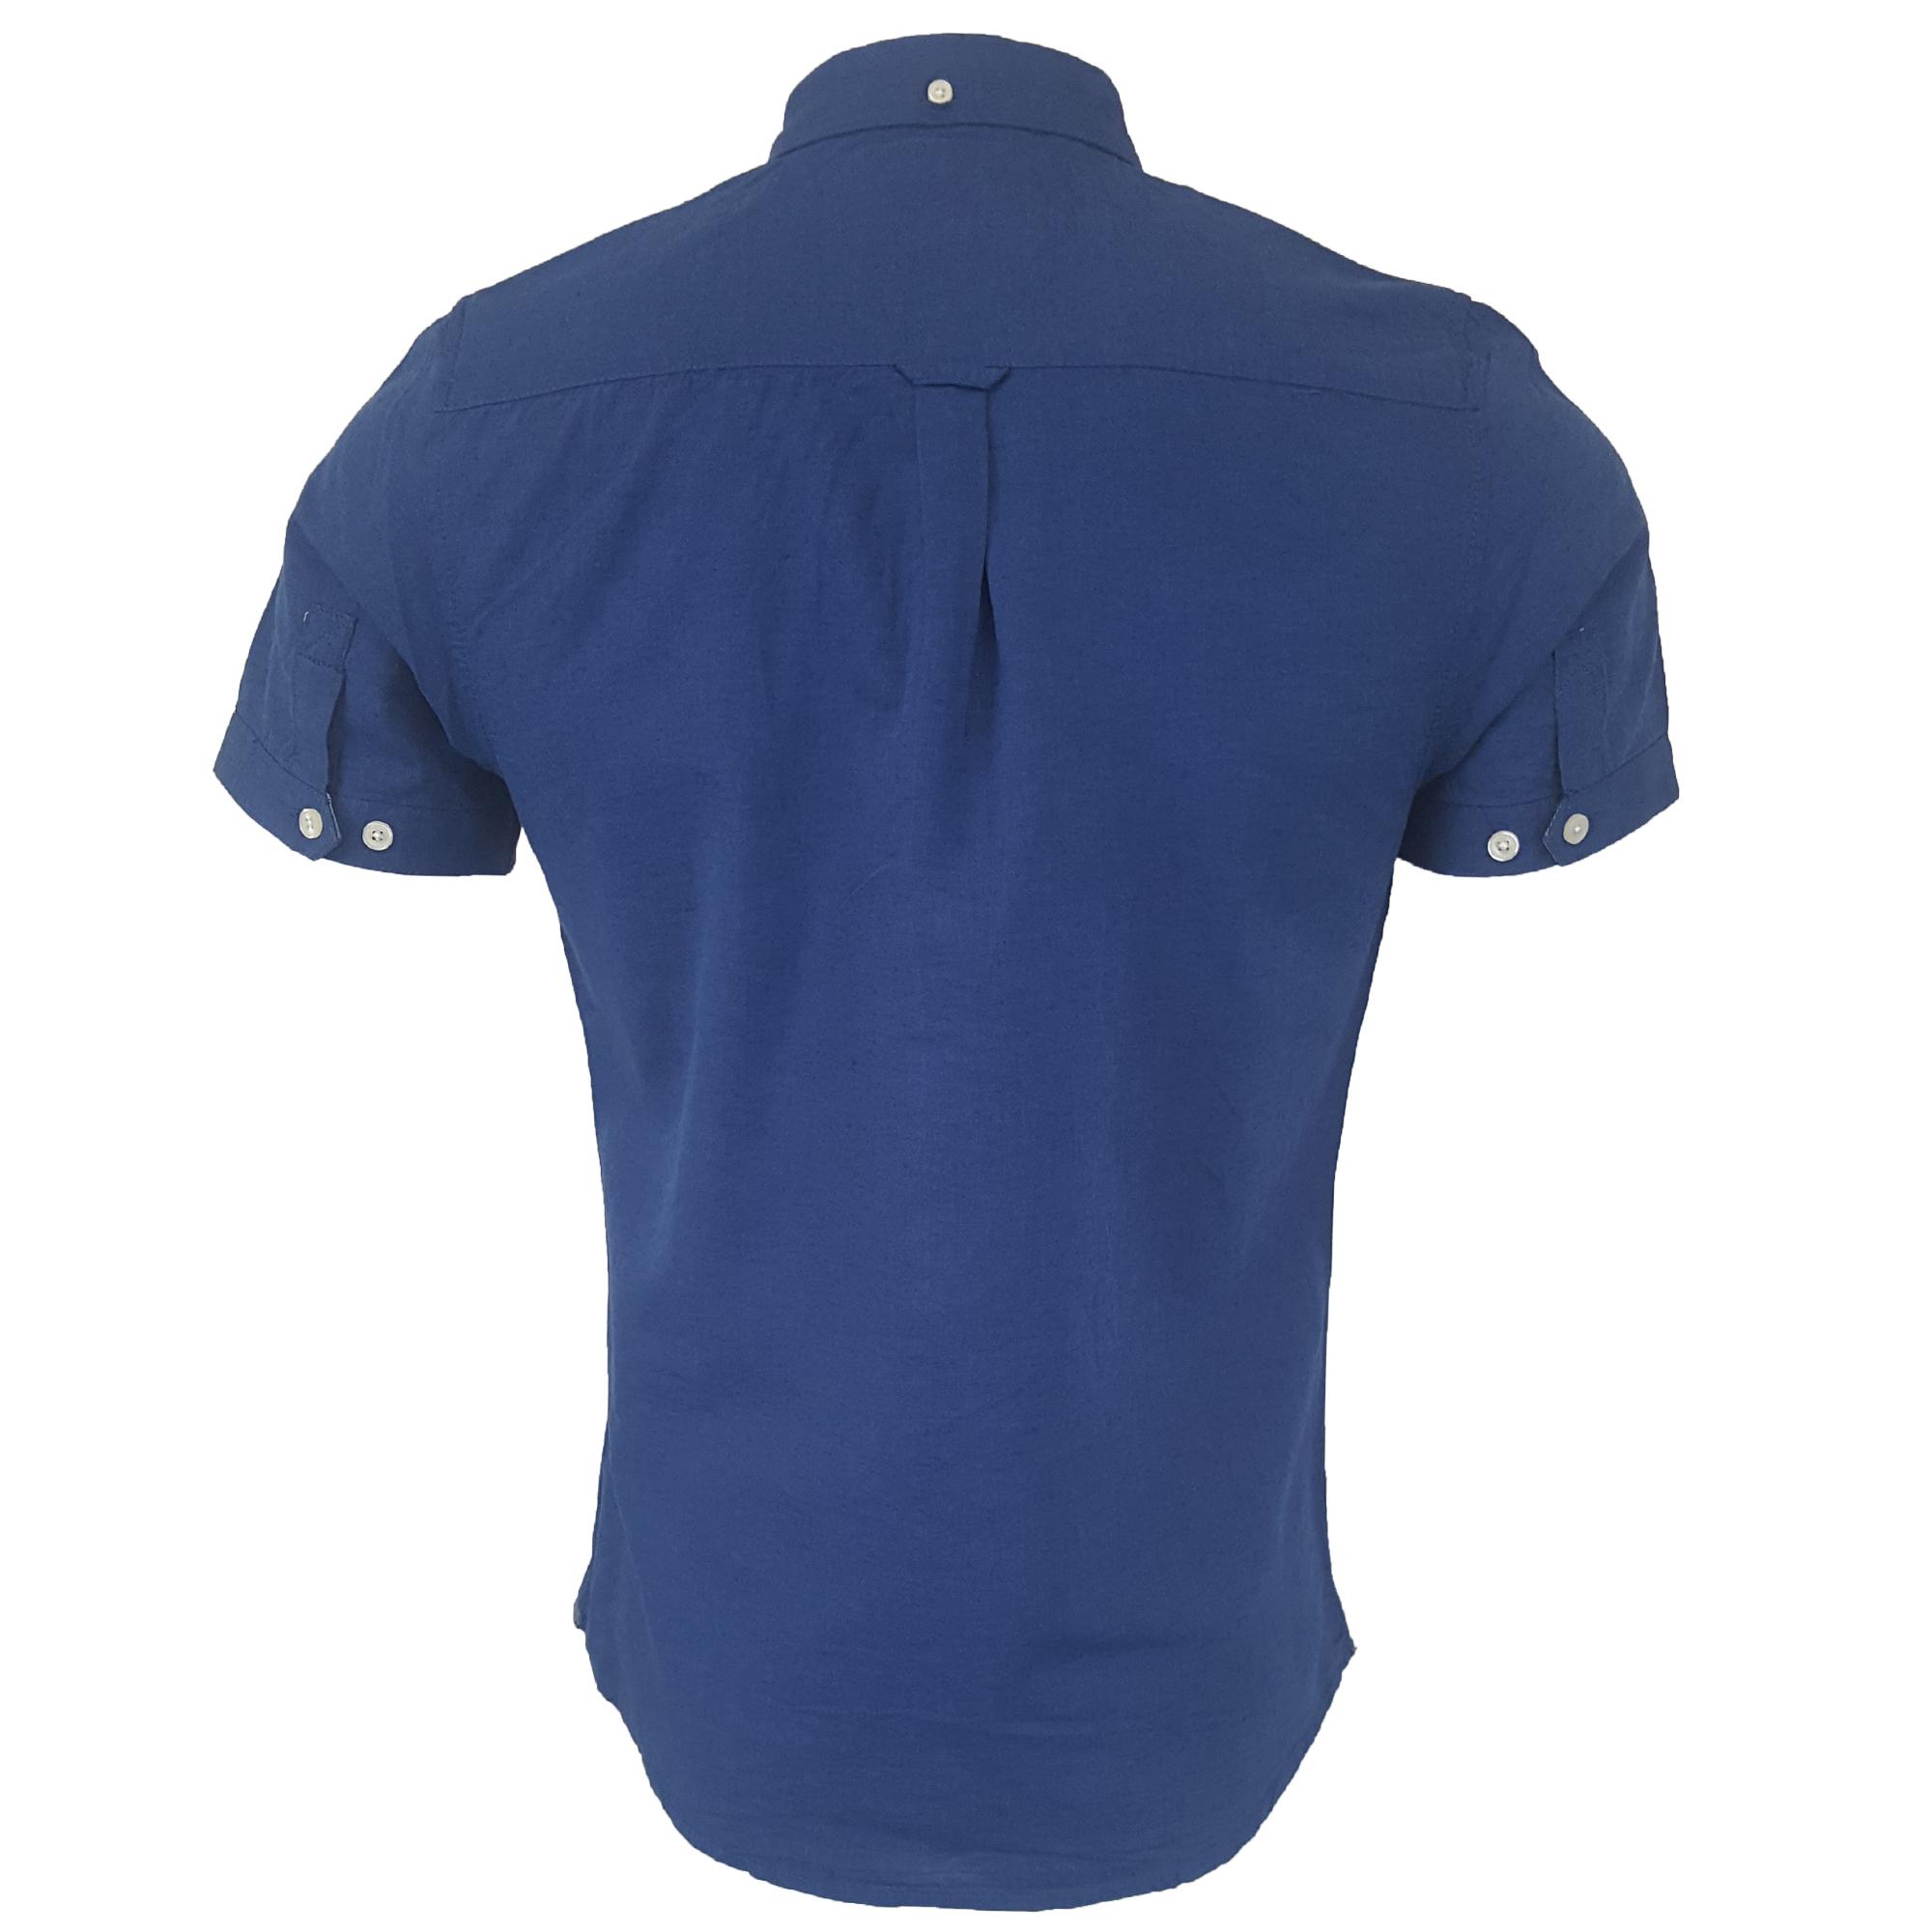 Mens-Linen-Cotton-Shirt-Tokyo-Laundry-Wells-Short-Sleeved-Grosvenor-Summer-New thumbnail 3